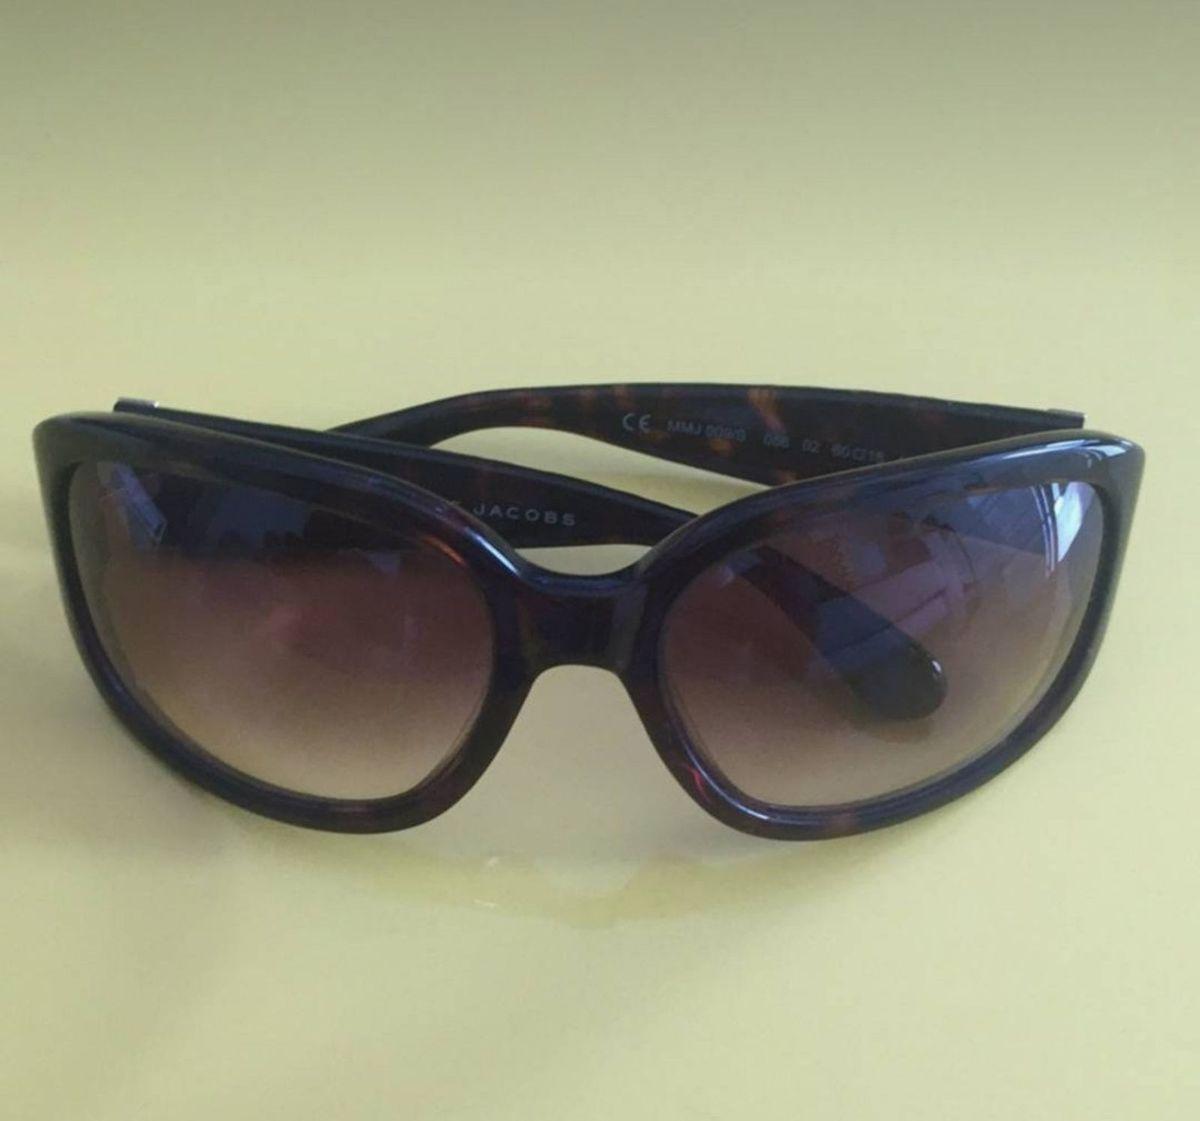 oculos marcs jacobs - óculos marc jacobs.  Czm6ly9wag90b3muzw5qb2vplmnvbs5ici9wcm9kdwn0cy83mzi2odcvywrkn2vinwzlzdazymu4ngvlnwzhmmuzywnhymzmmgiuanbn  ... 416b62b01b